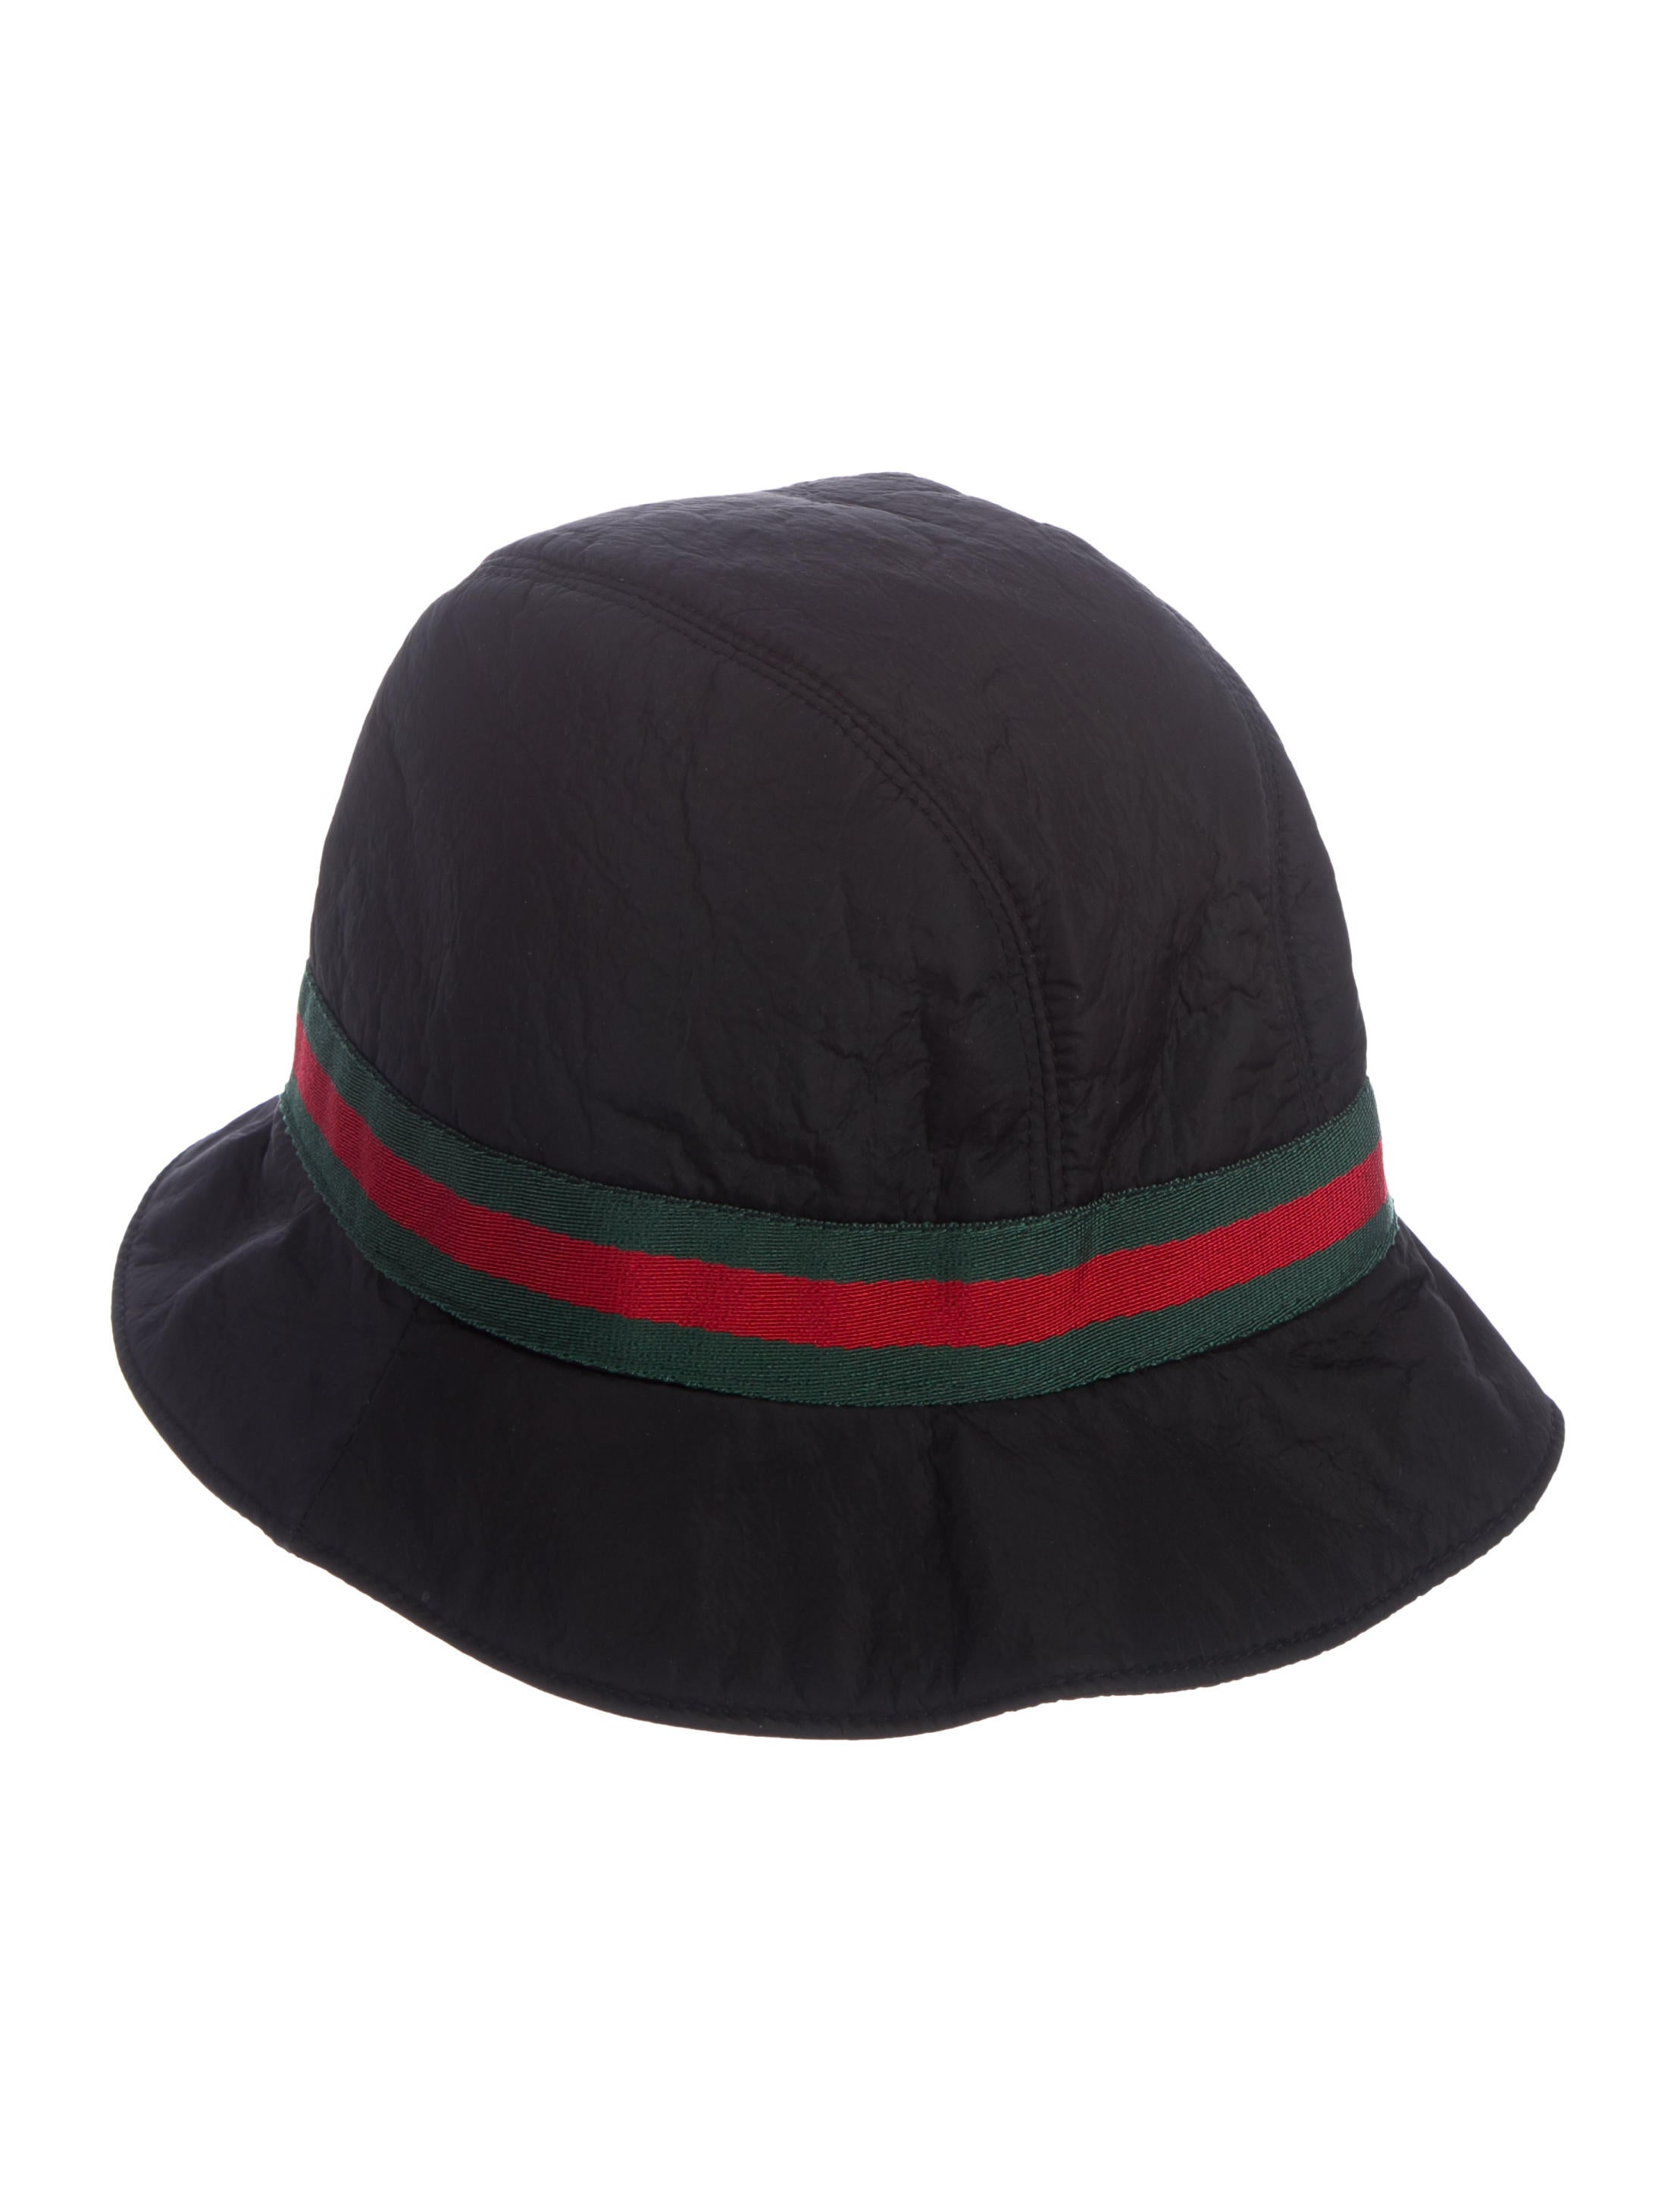 615caef1a8ec Gucci Web Bucket Hat - Accessories - GUC292028